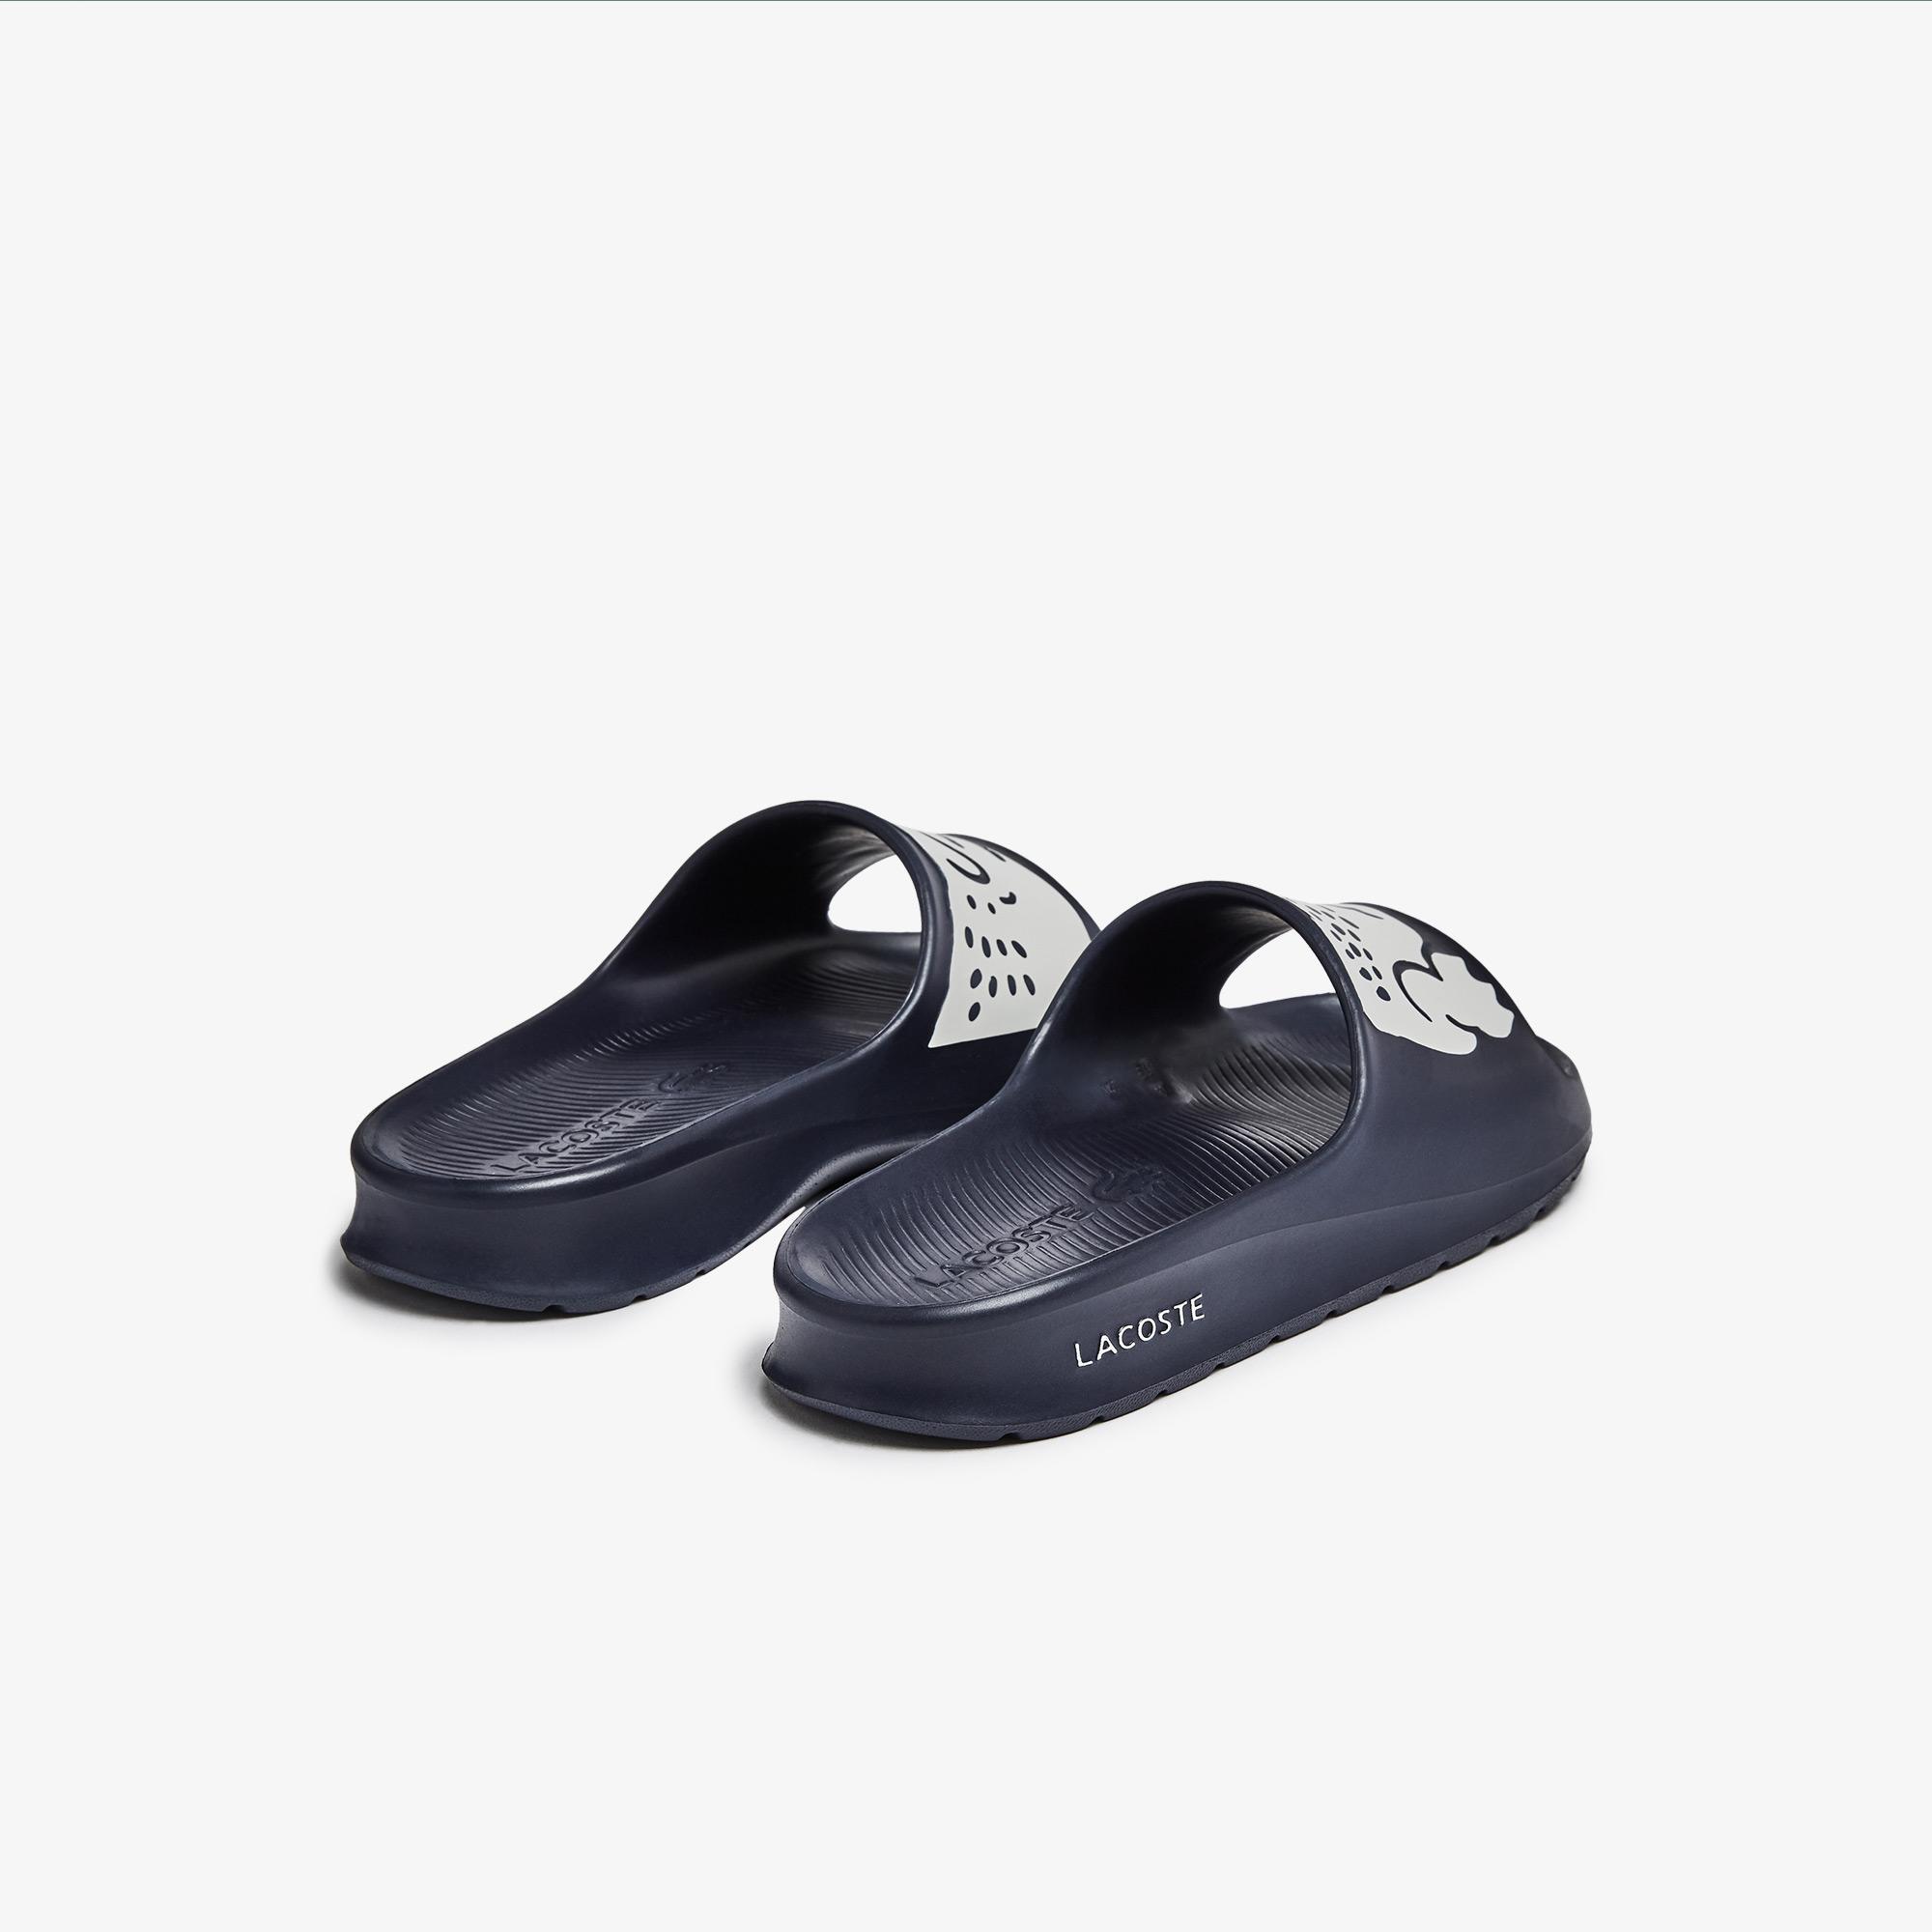 Lacoste Damskie buty Croco 2.0 0721 1 Cfa